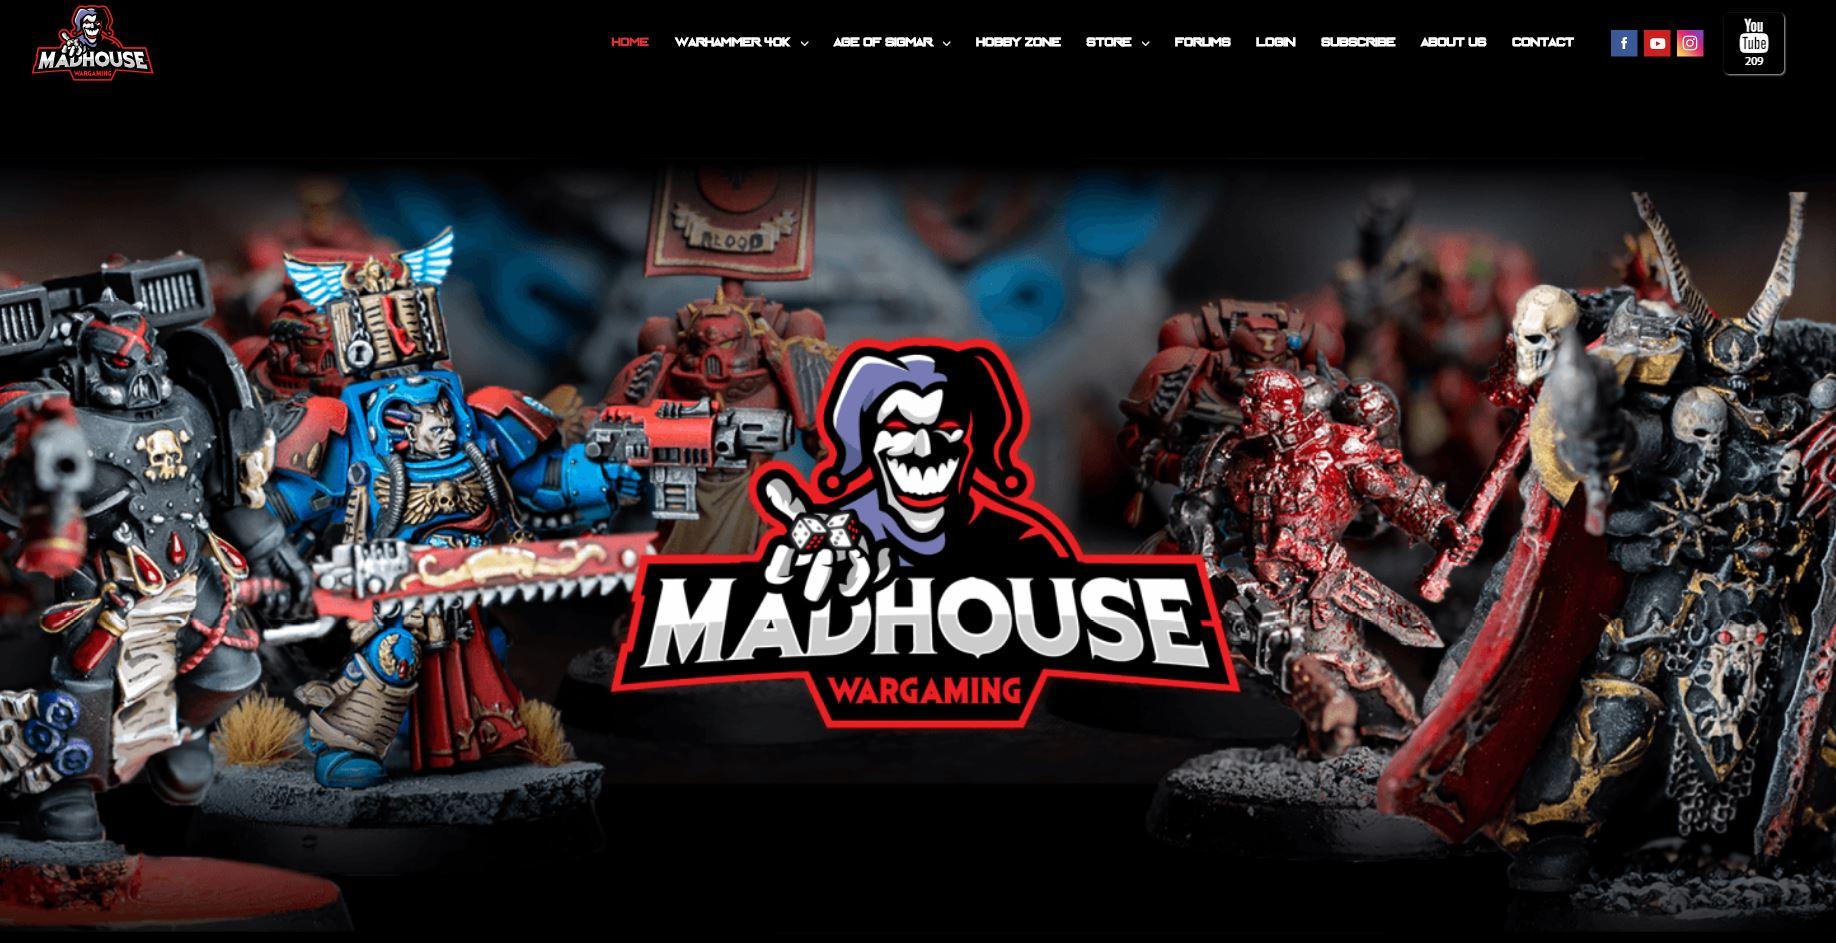 Madhouse Wargaming